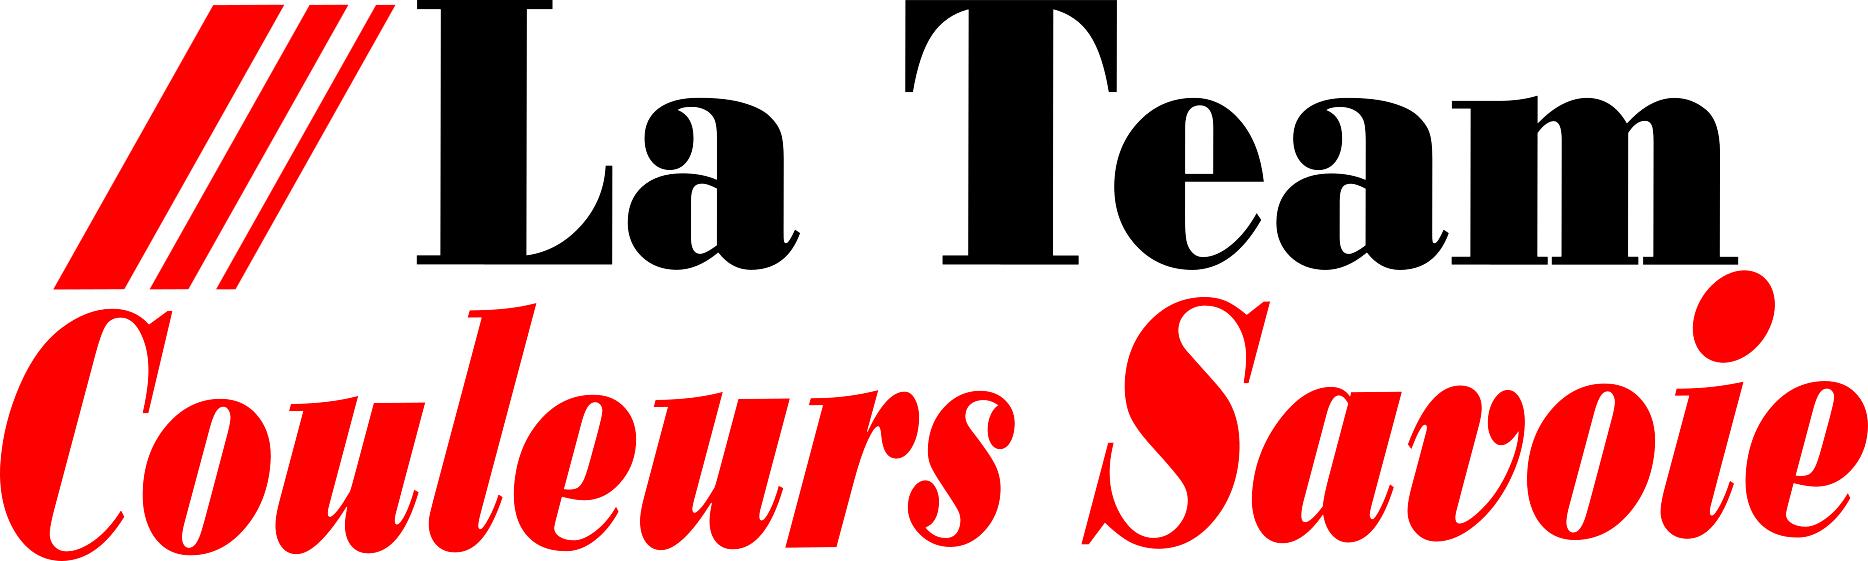 Logo ltcs